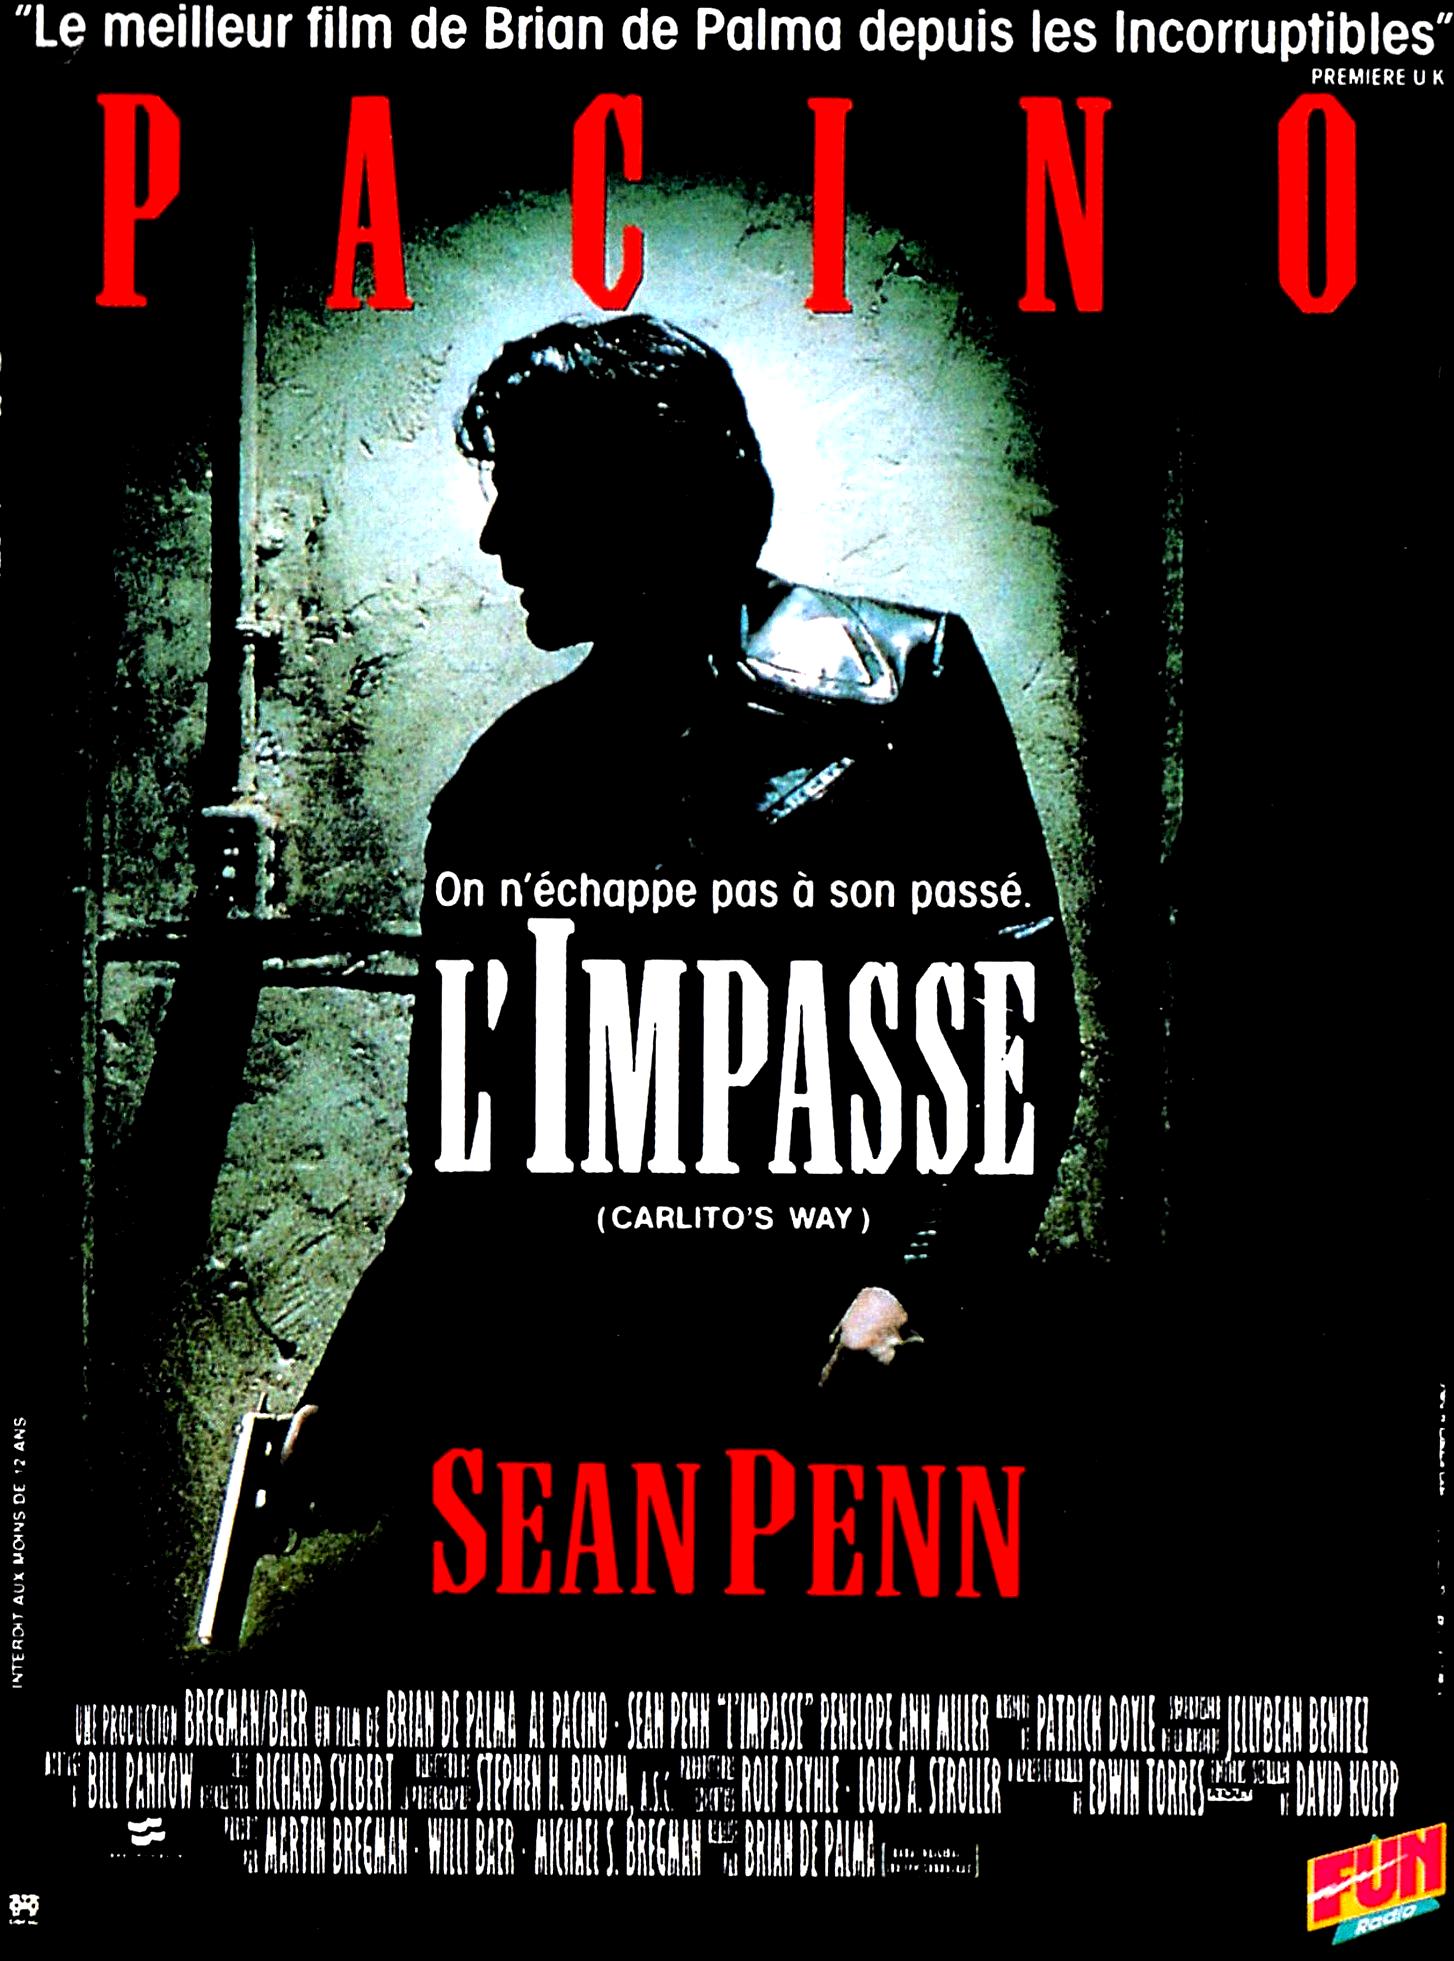 affiche du film L'Impasse